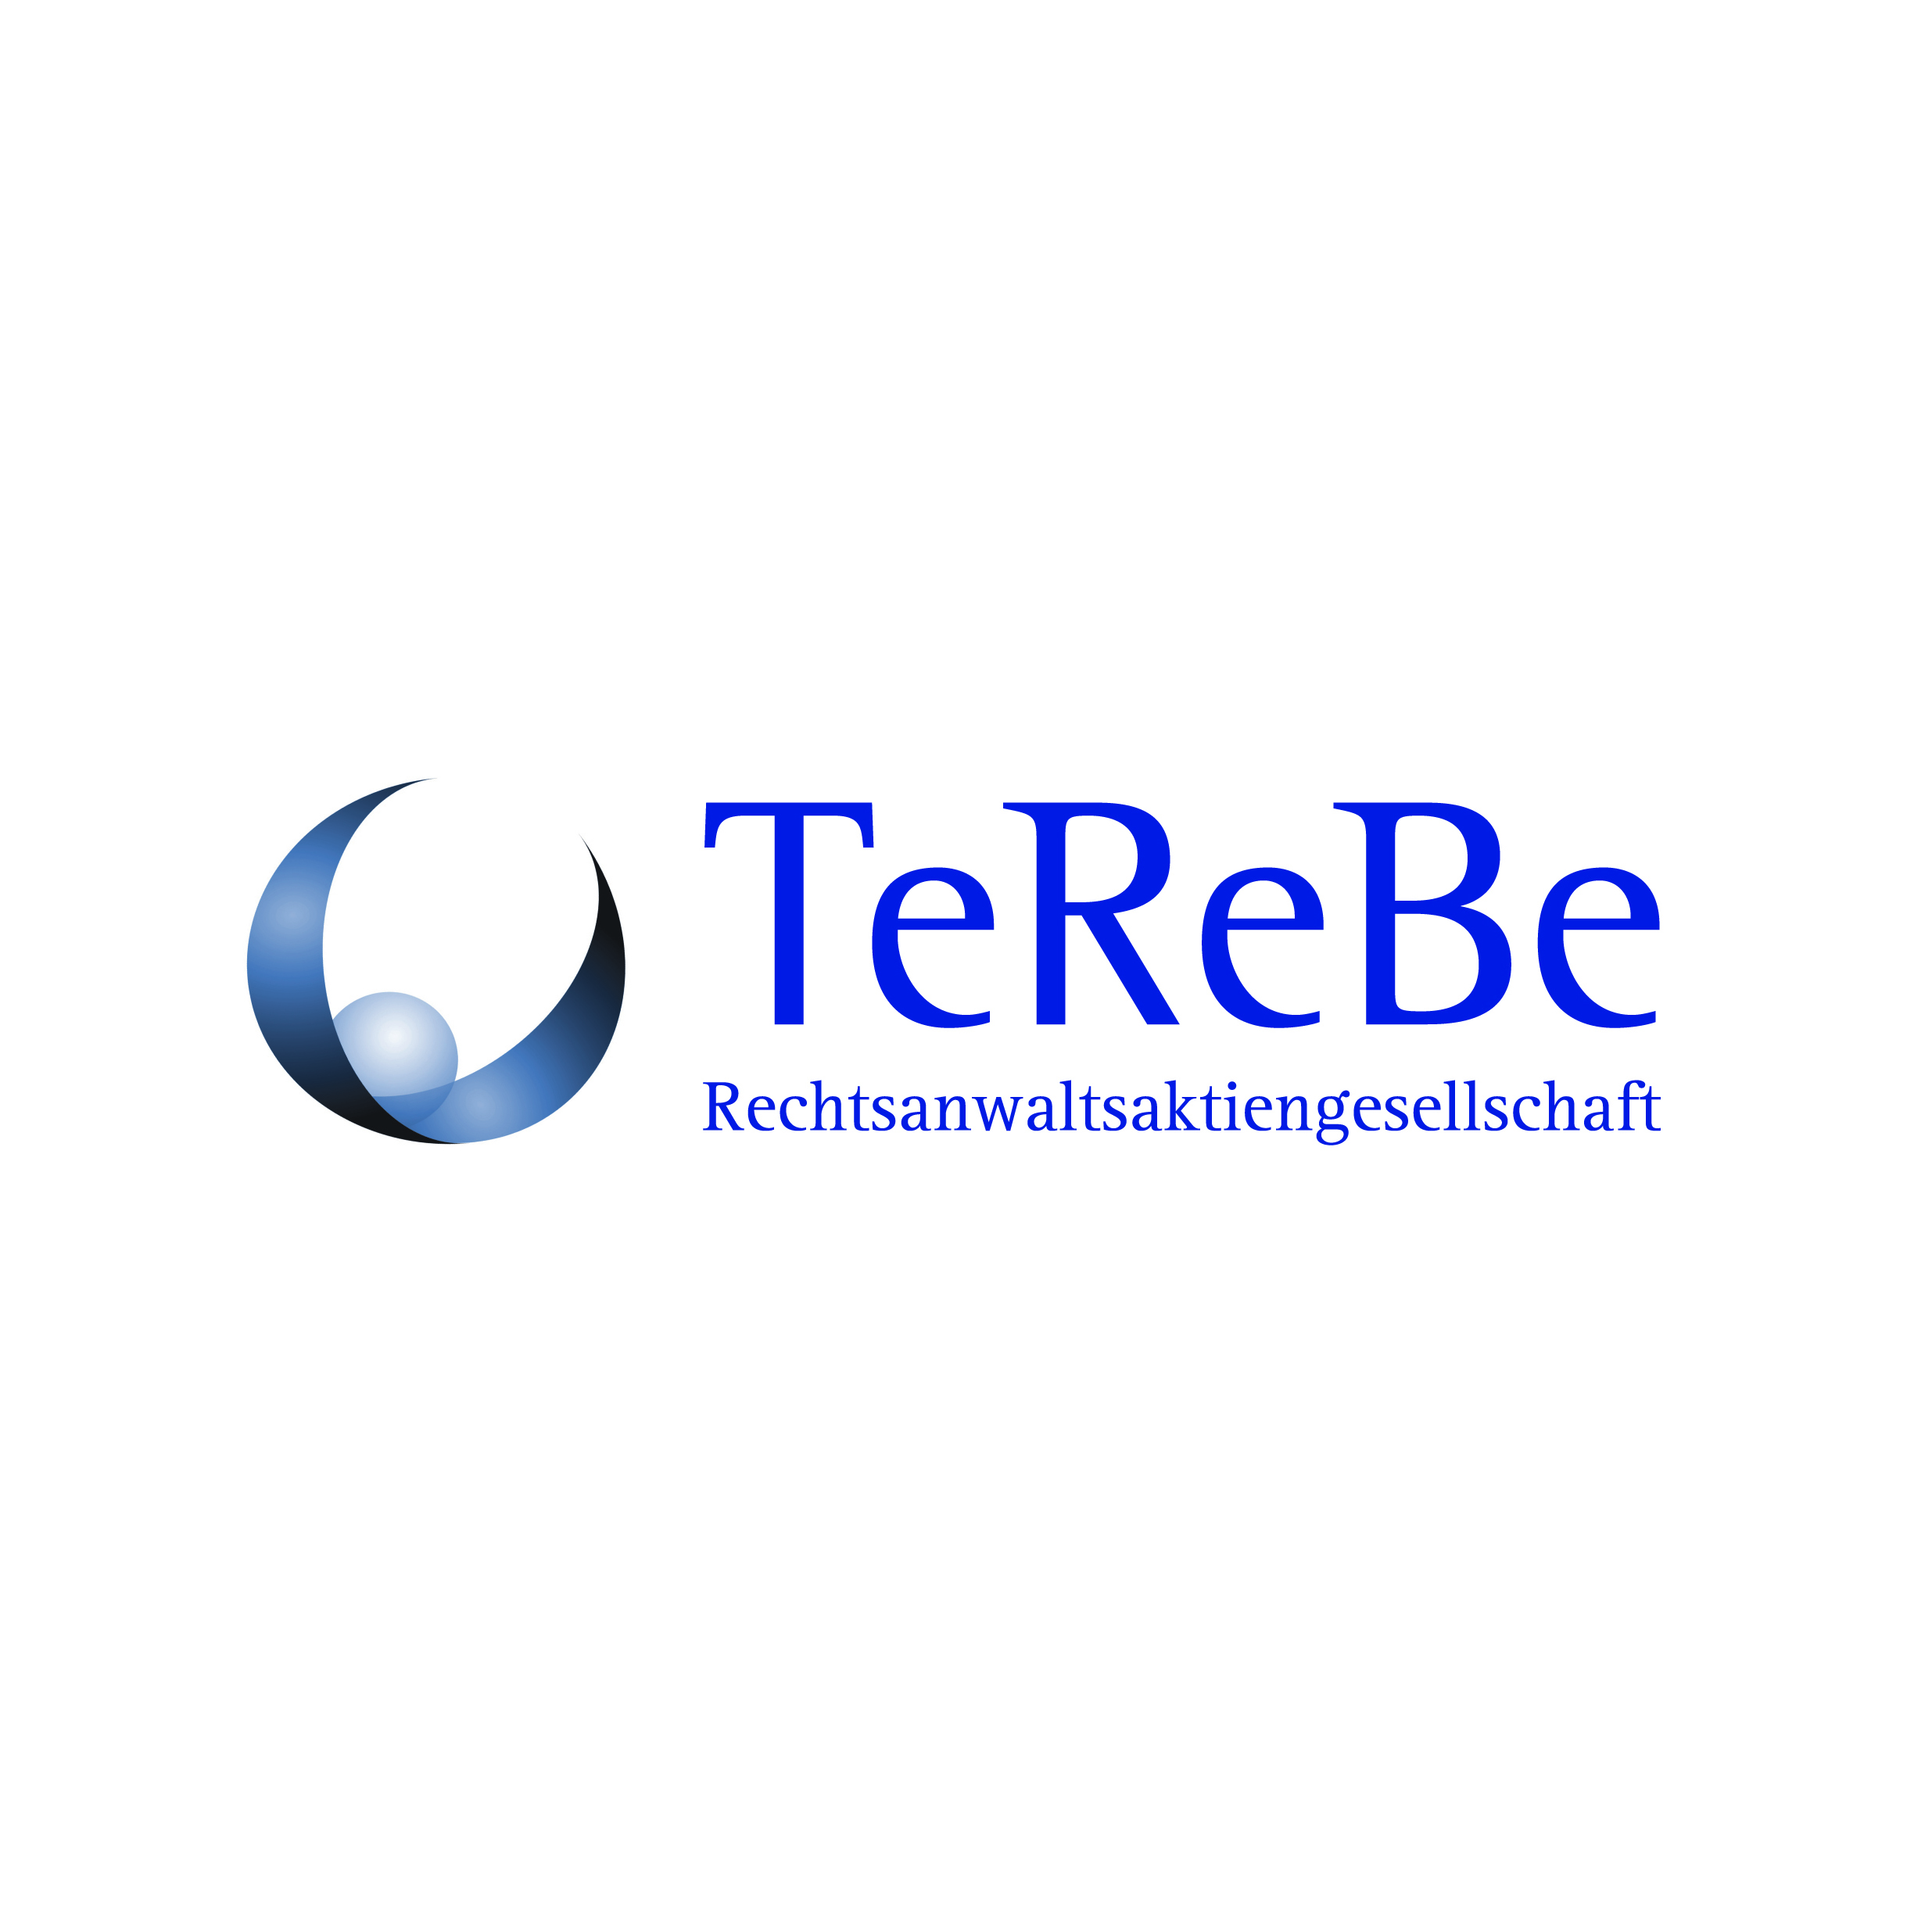 Partnerlogo TeReBe Rechtsanwaltsaktiengesellschaft